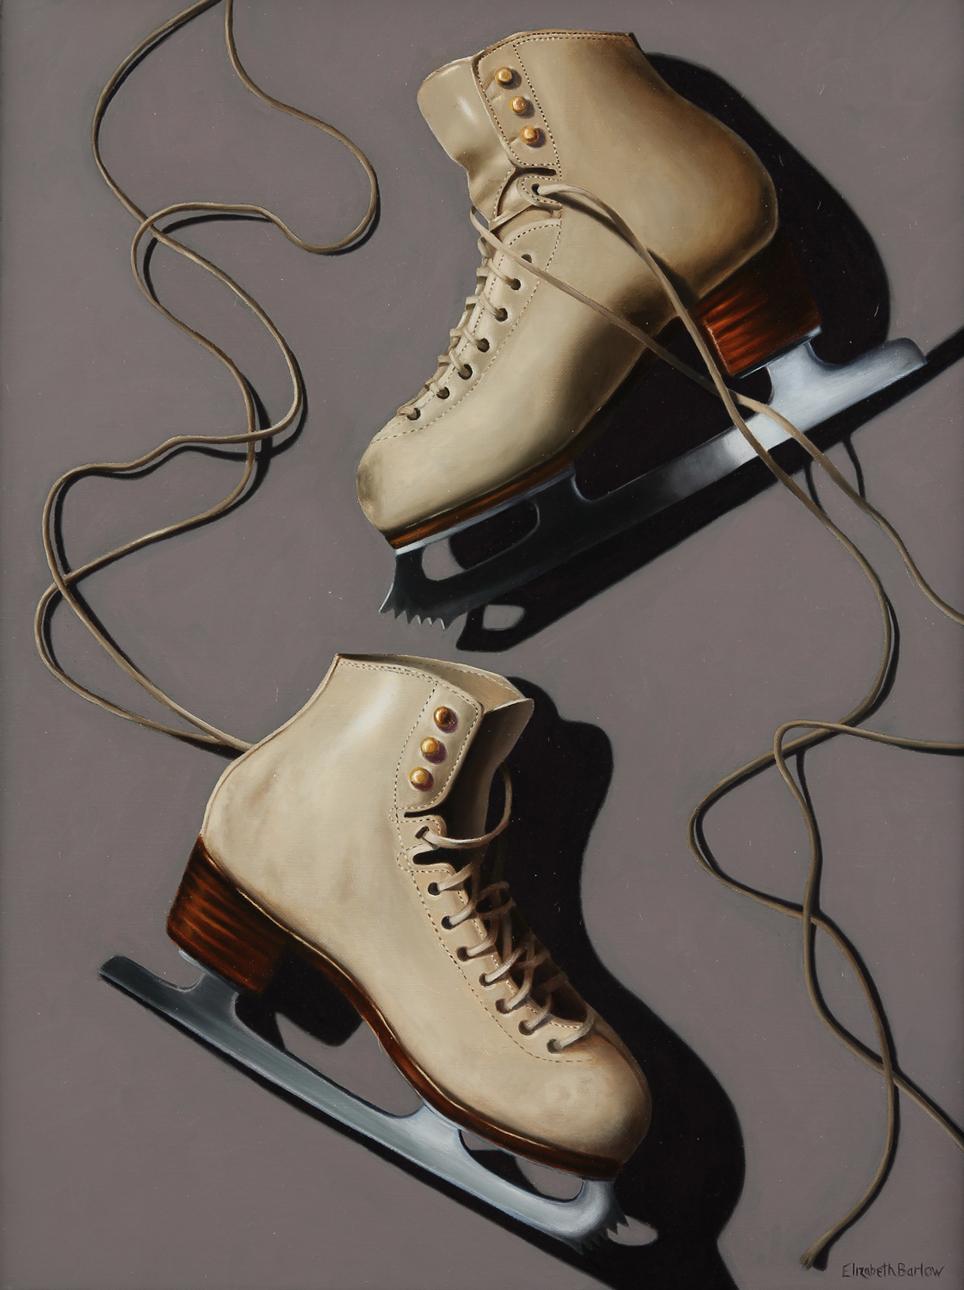 Portrait of a Figure Skater